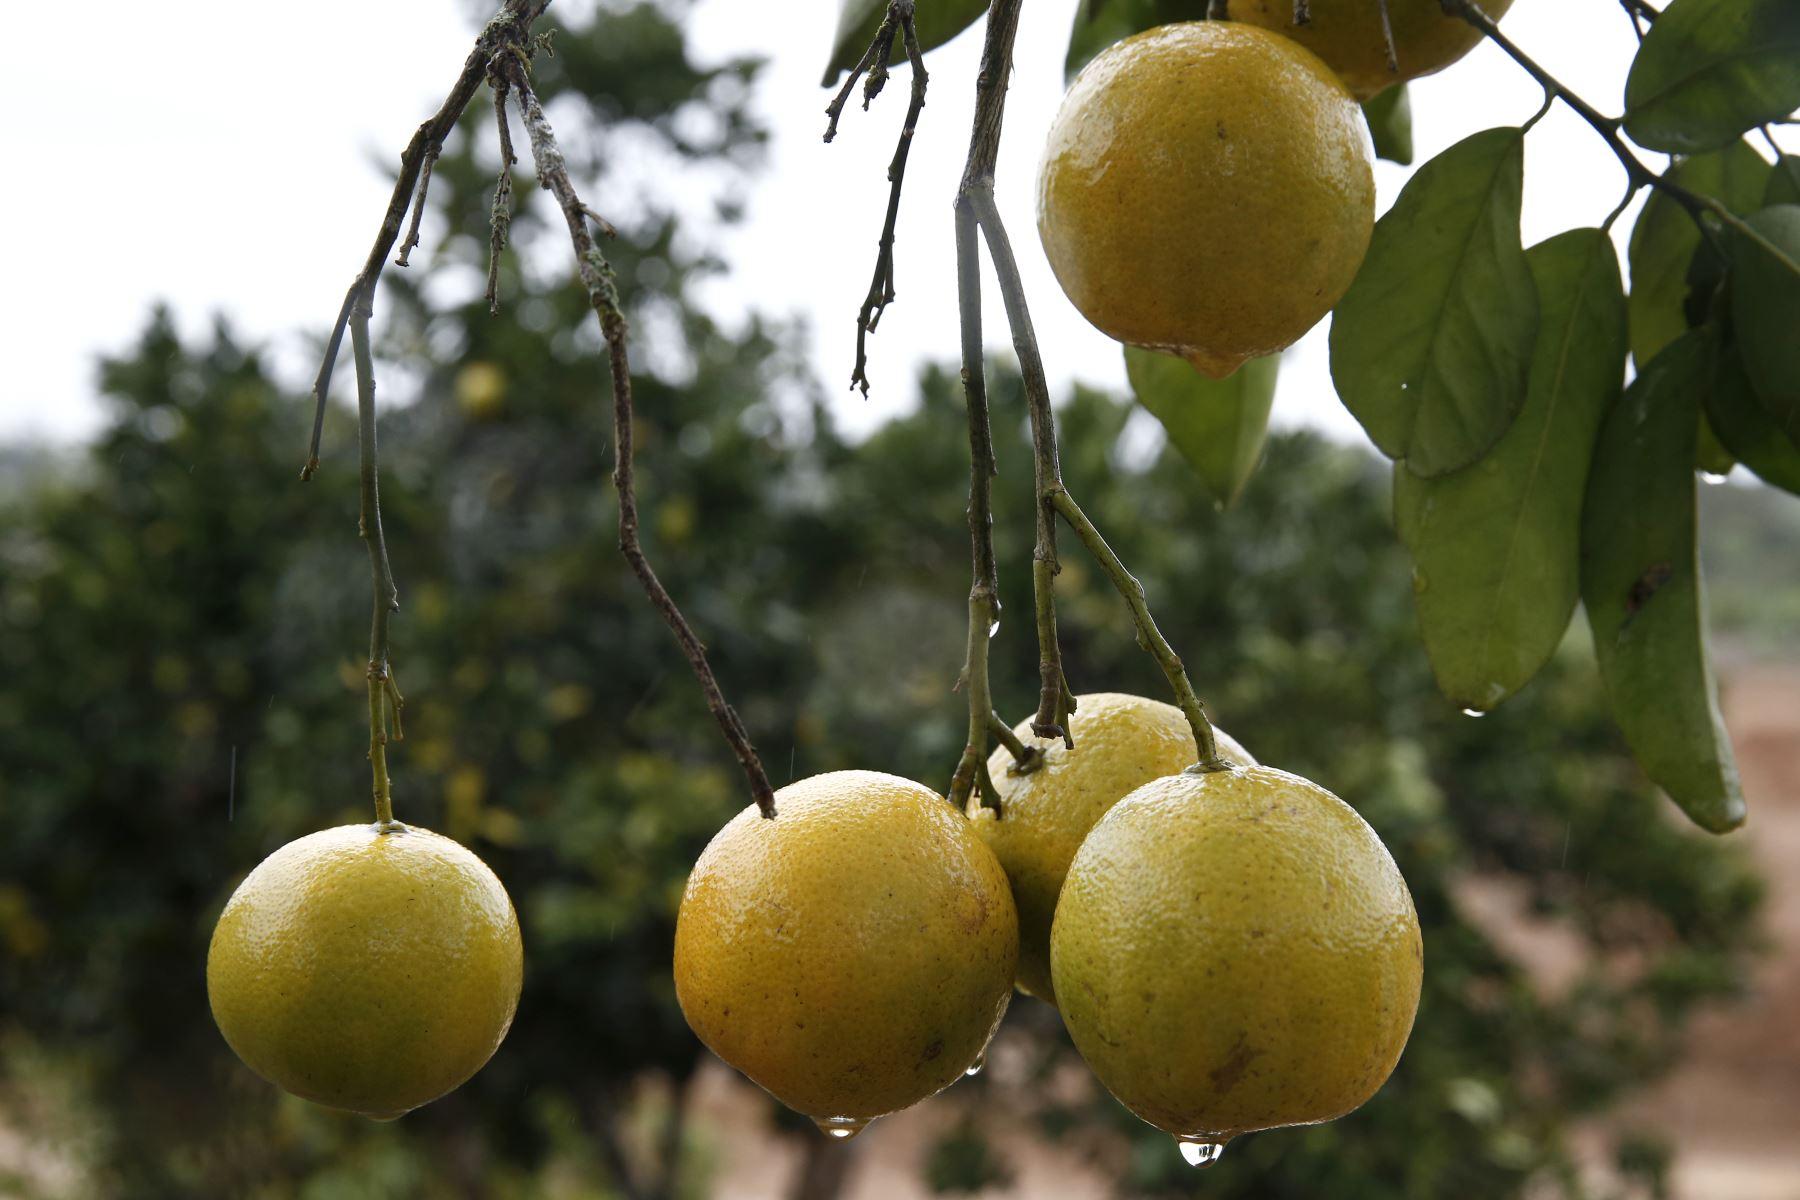 Cultivos de naranja, Chanchamayo. Foto: ANDINA/Melina Mejía